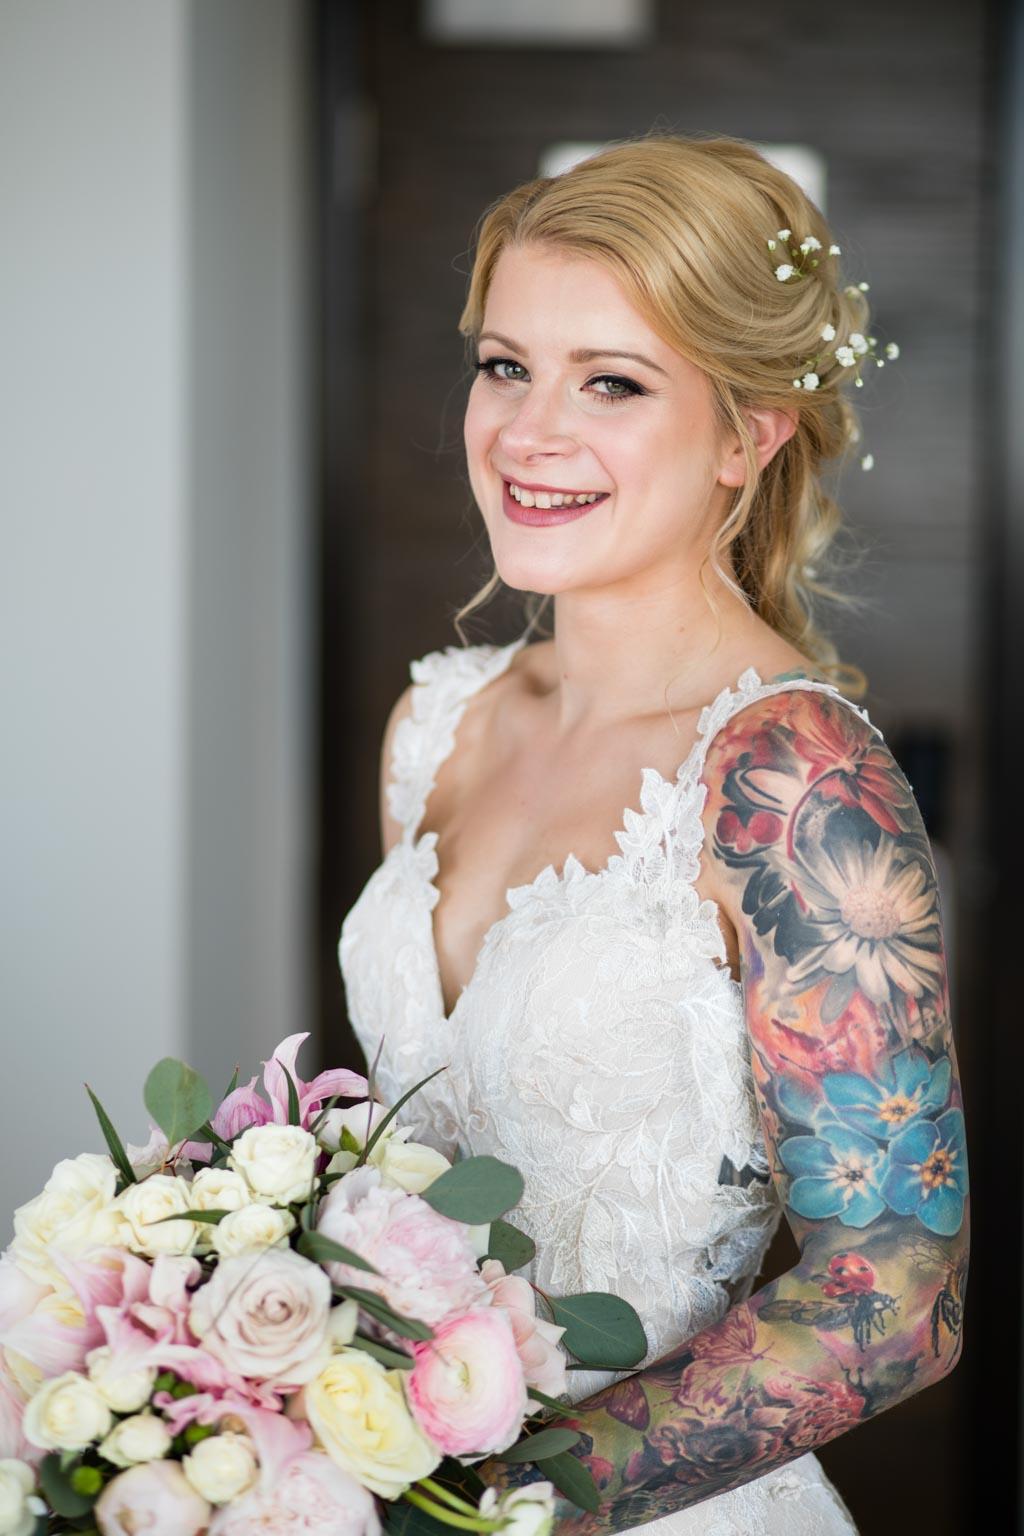 tattooed bride with bouquet portrait